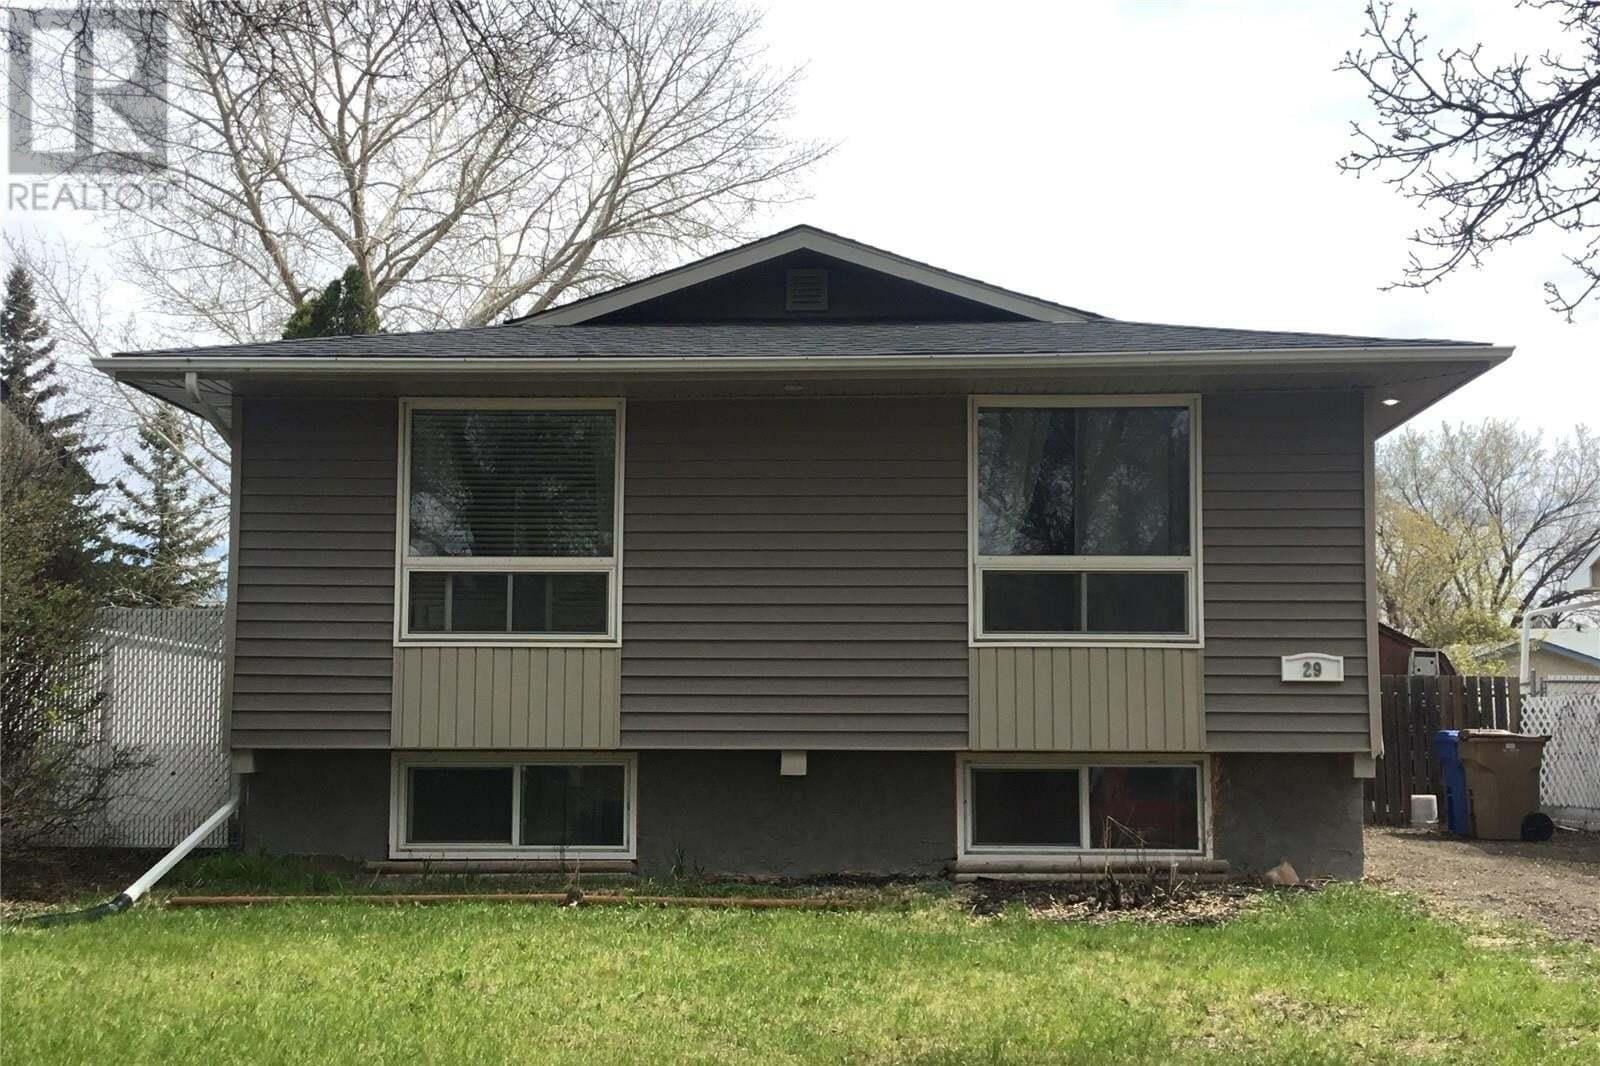 House for sale at 29 Willowview St Regina Saskatchewan - MLS: SK814688